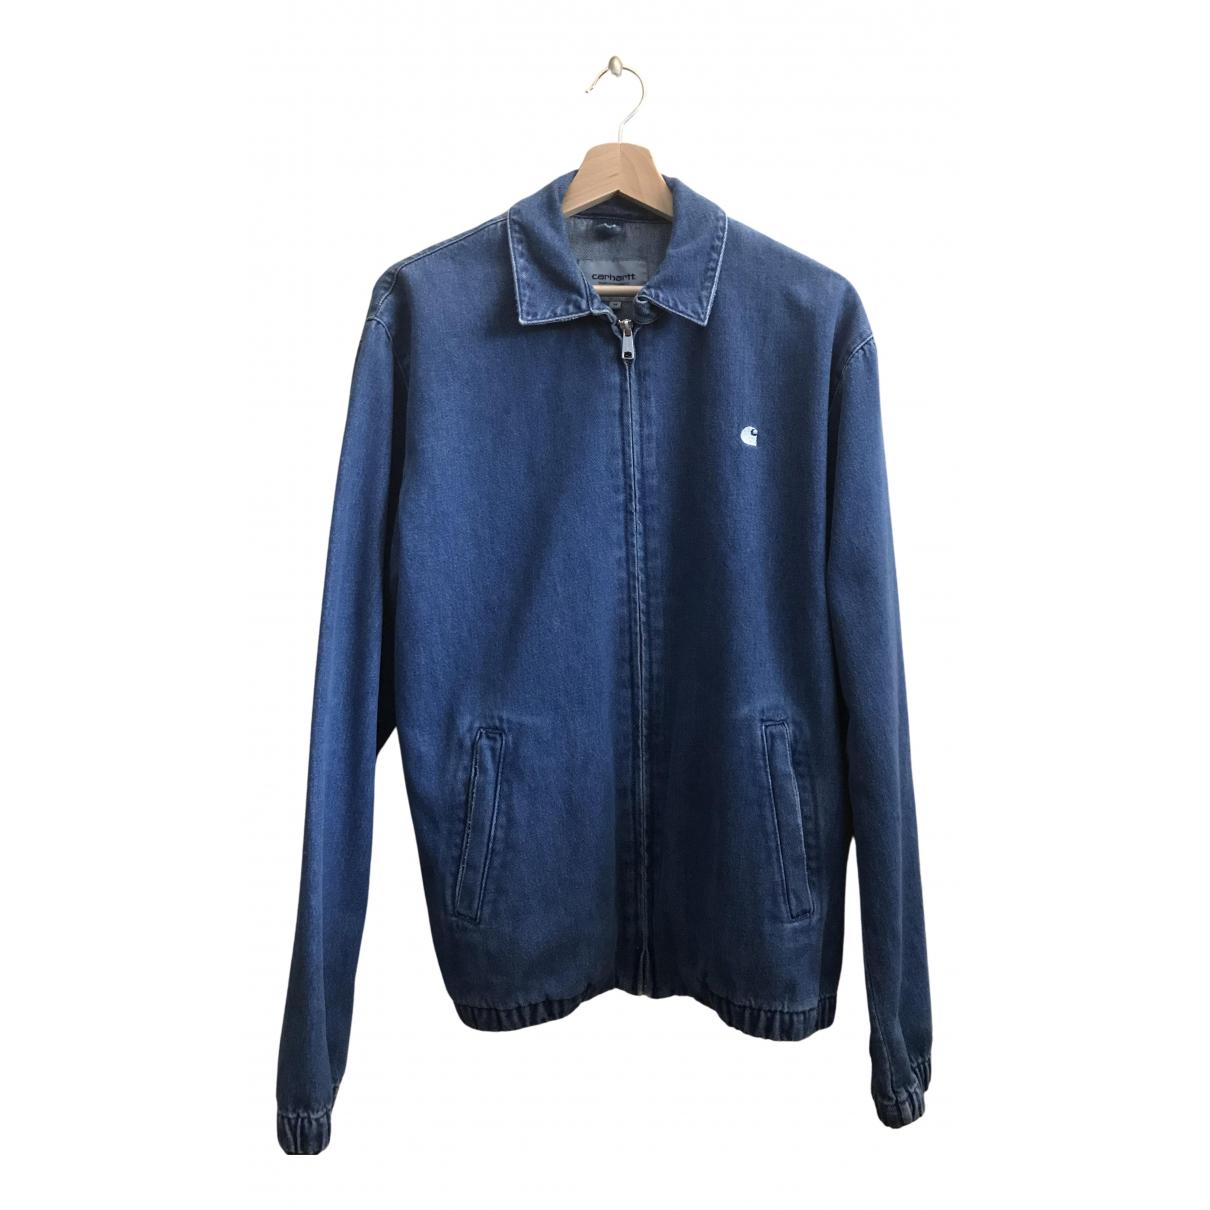 Carhartt \N Jacke in  Blau Denim - Jeans